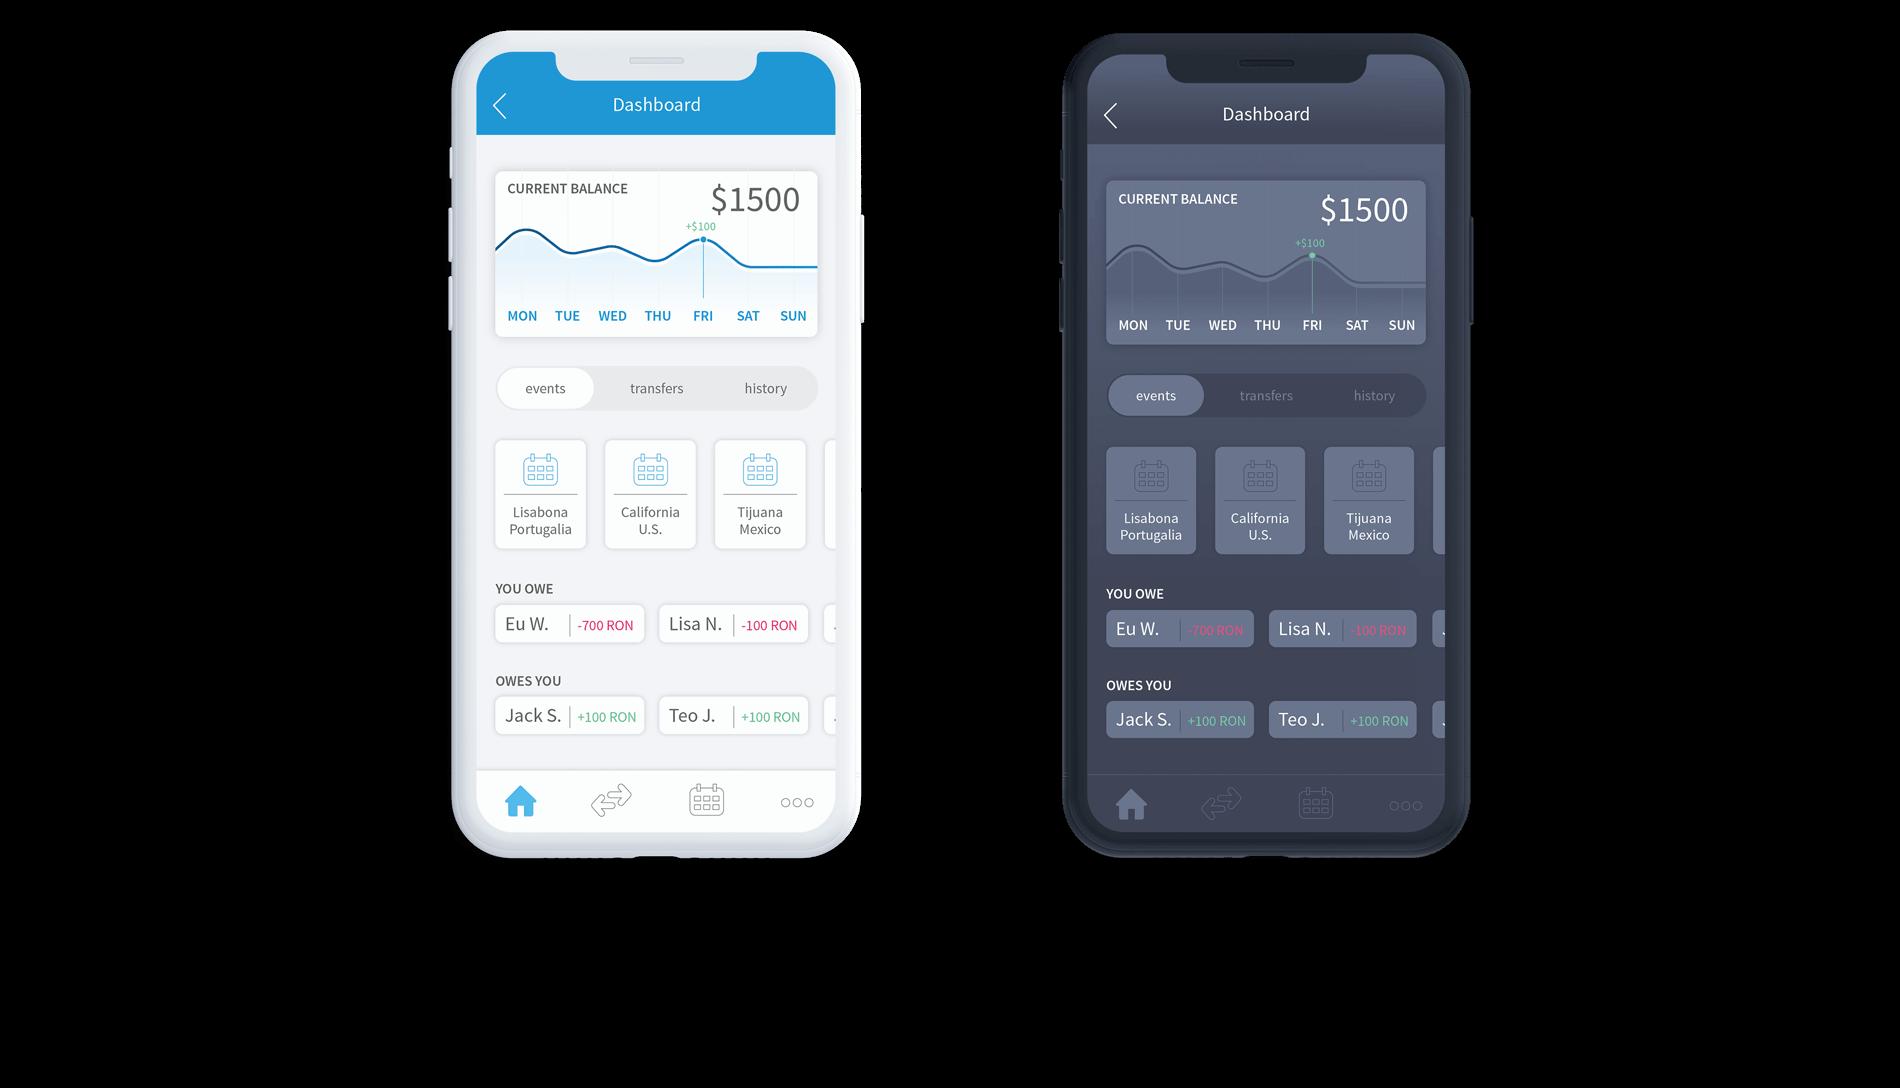 D'neros Financial App